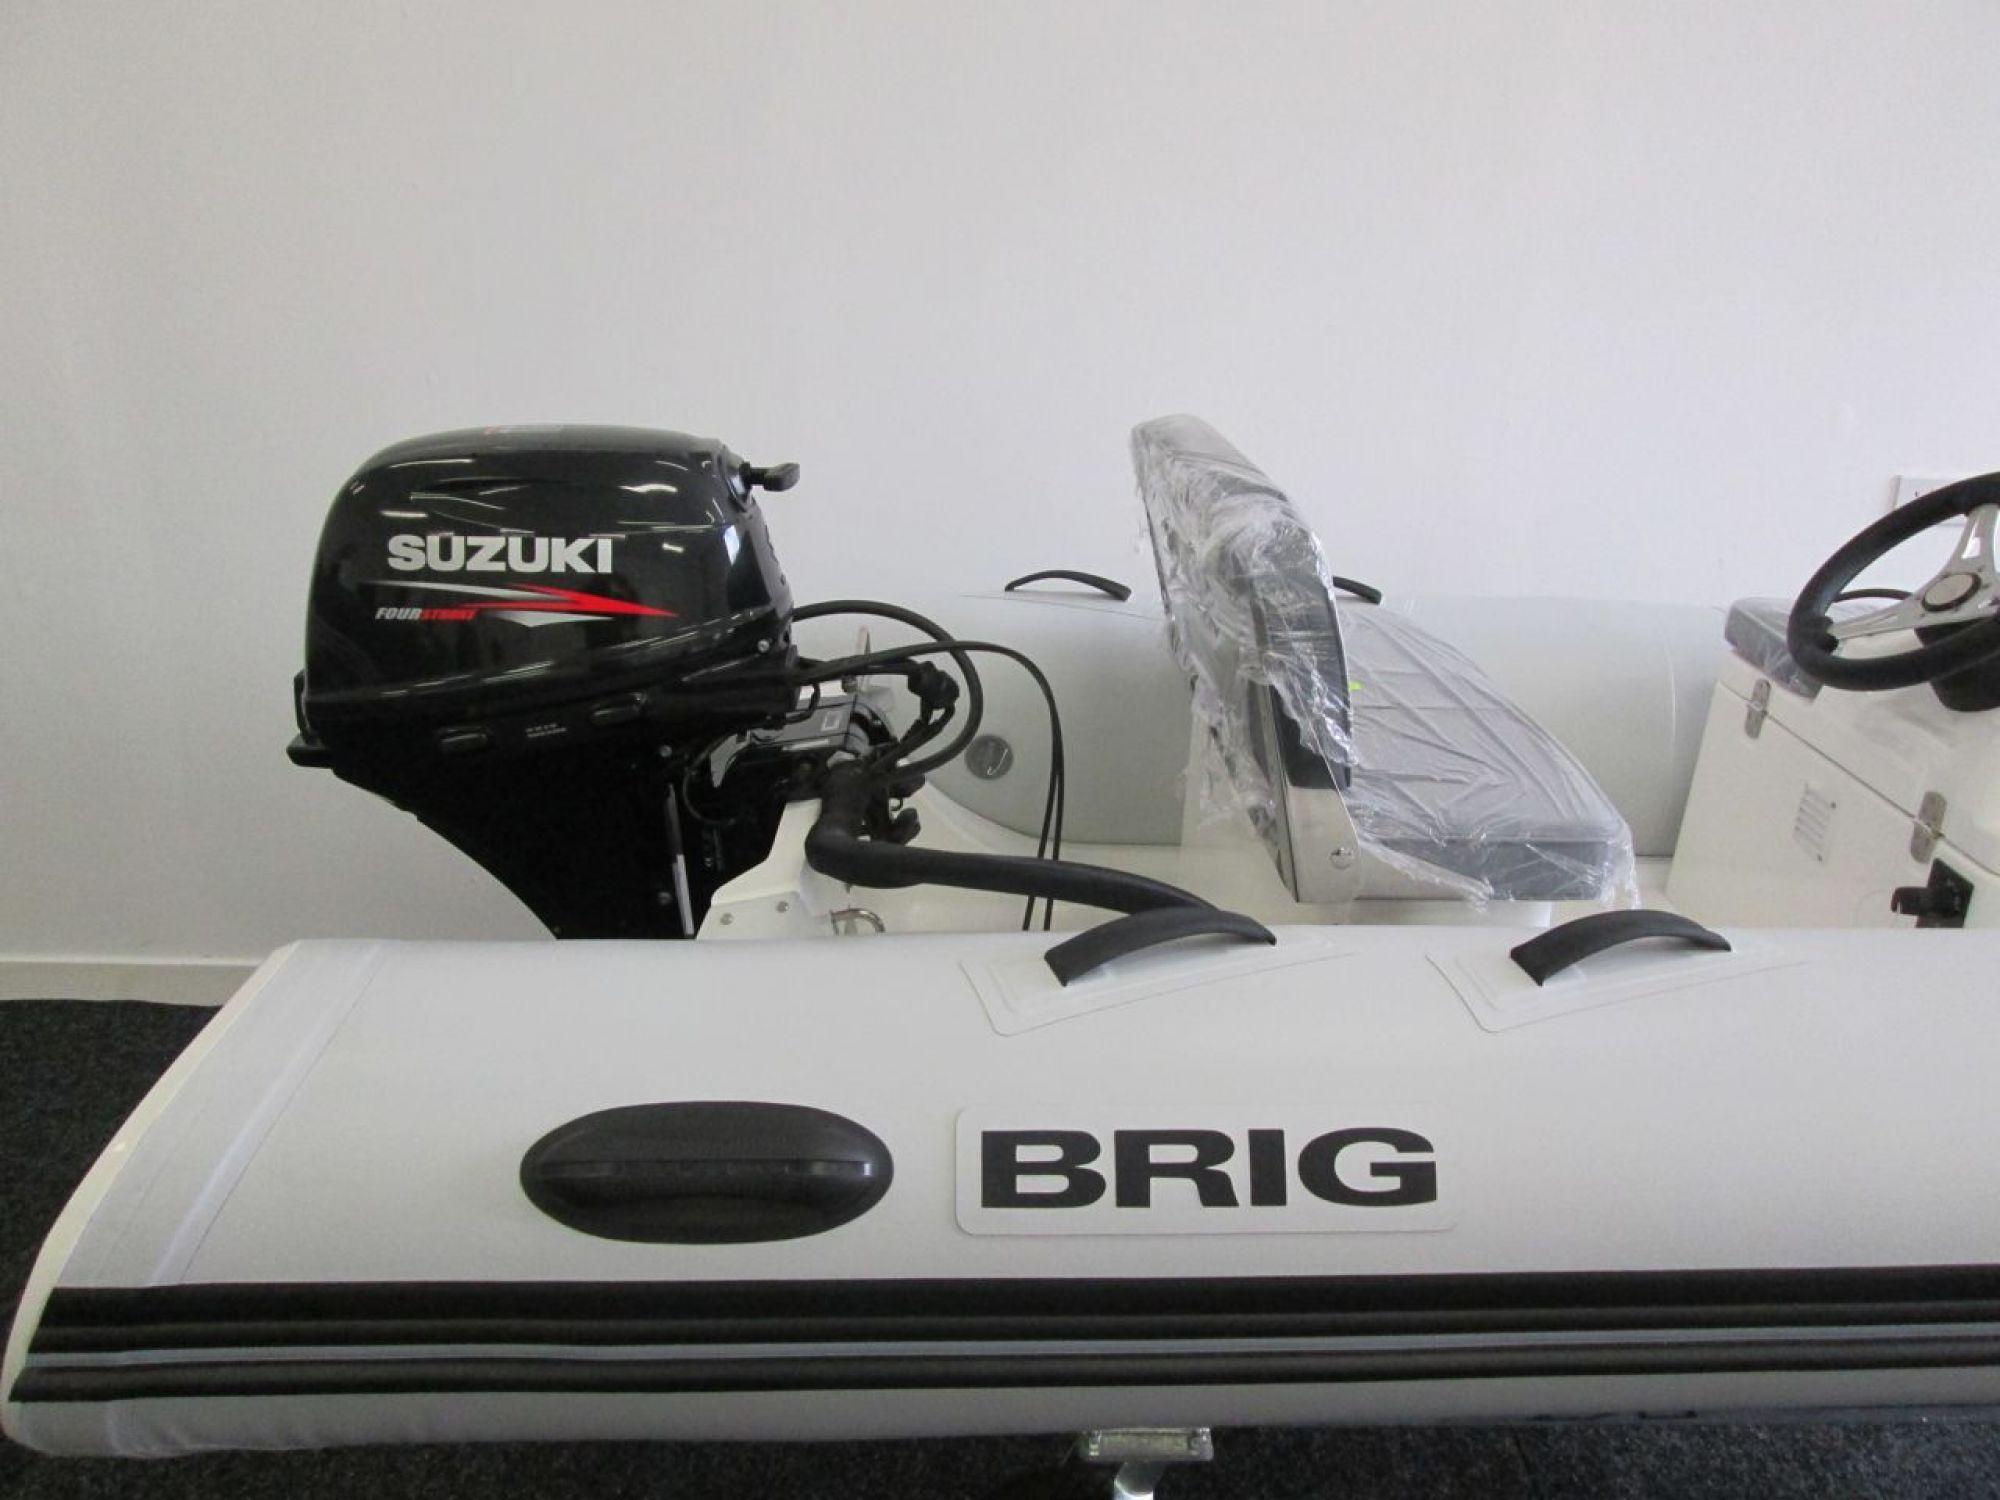 BRIG F330 helm seat